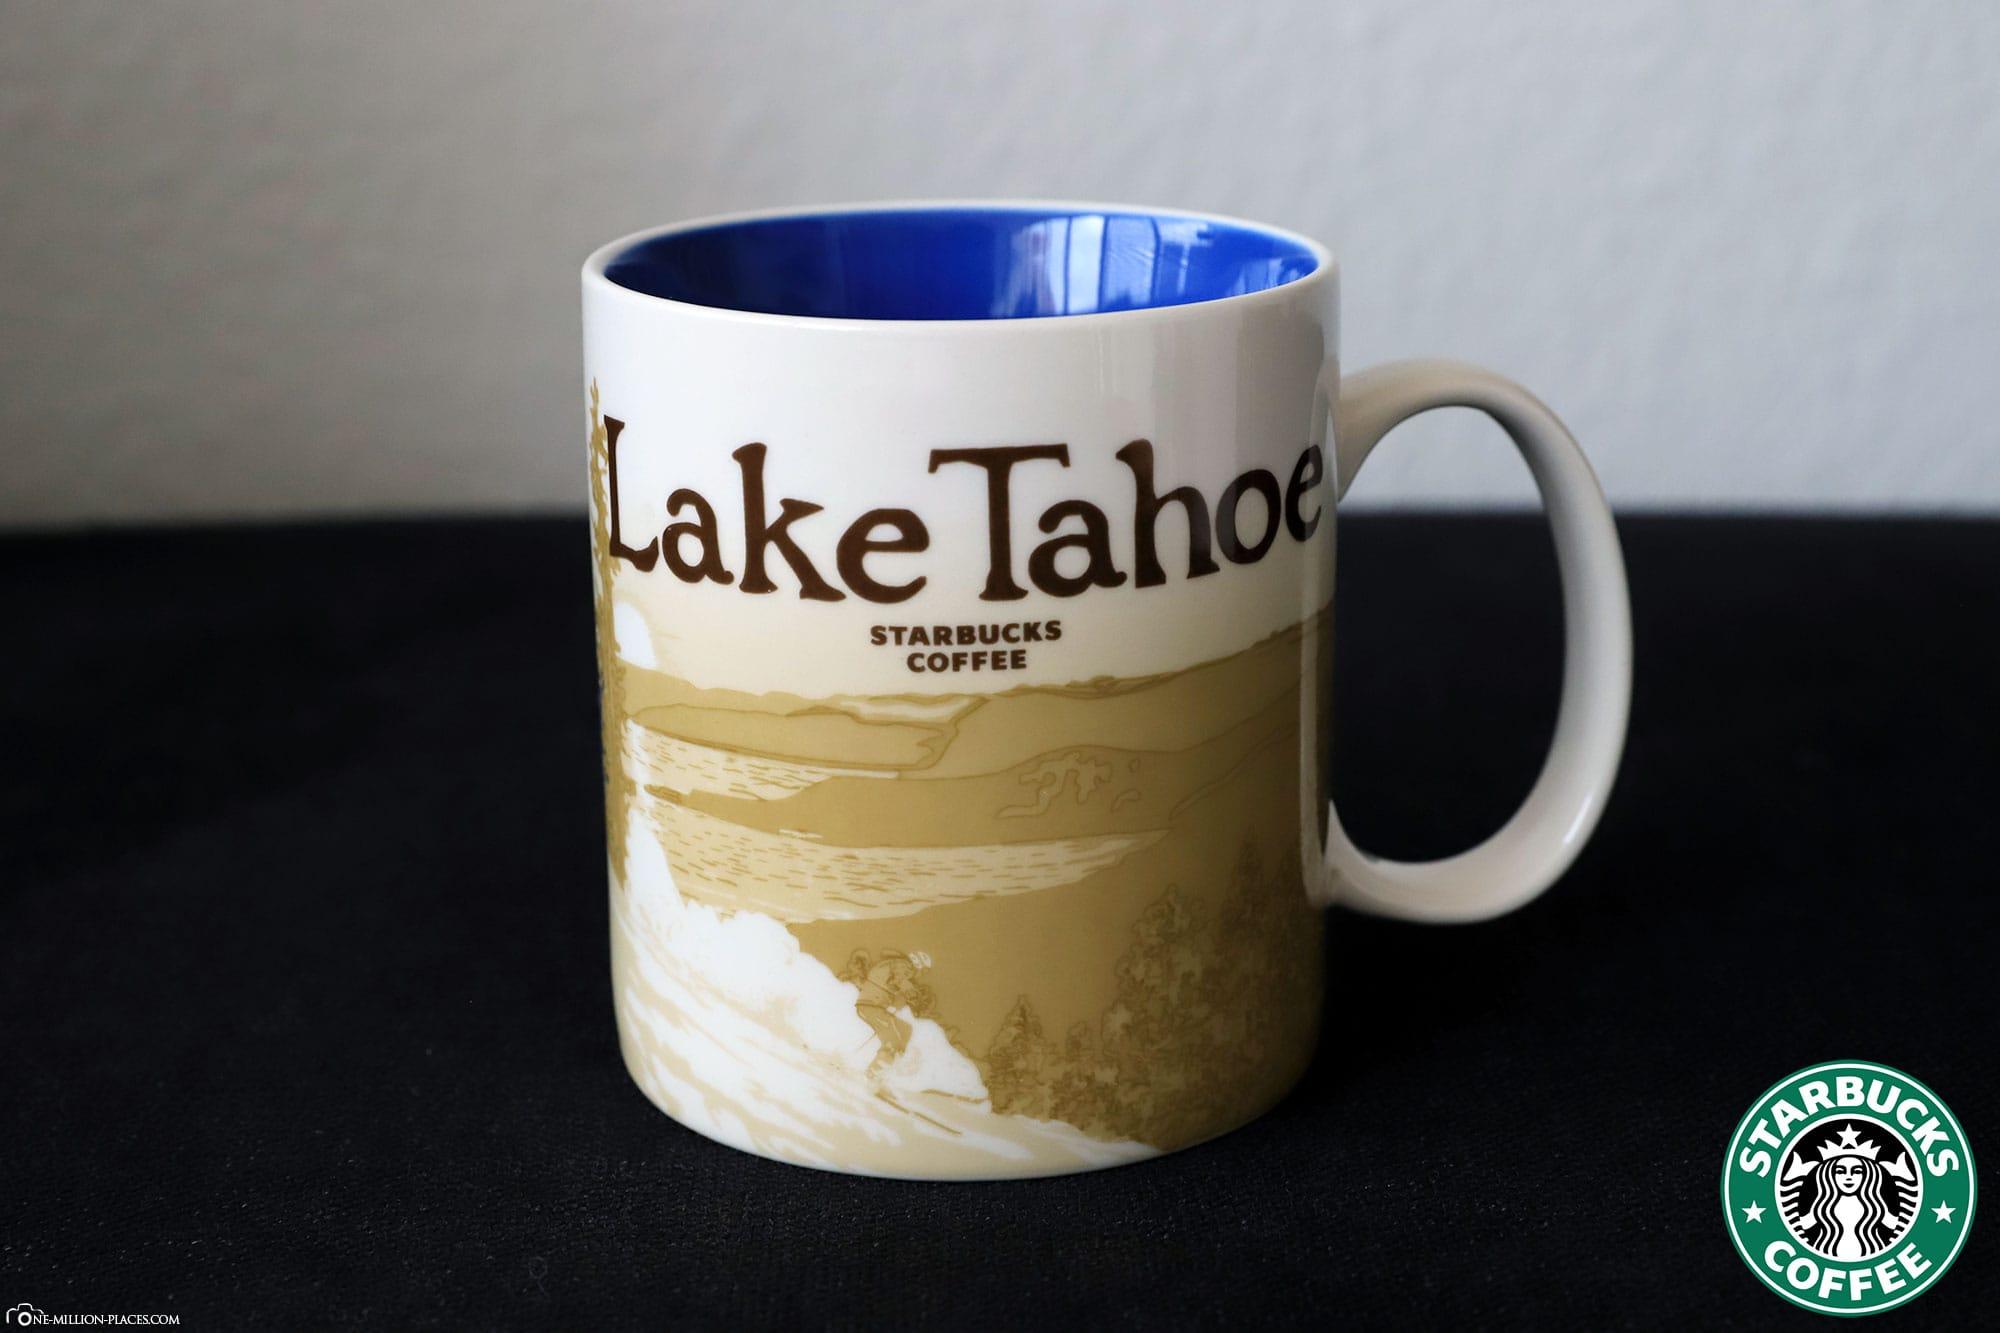 Lake Tahoe, Starbucks Tasse, Global Icon Serie, City Mugs, Sammlung, USA, Reisebericht